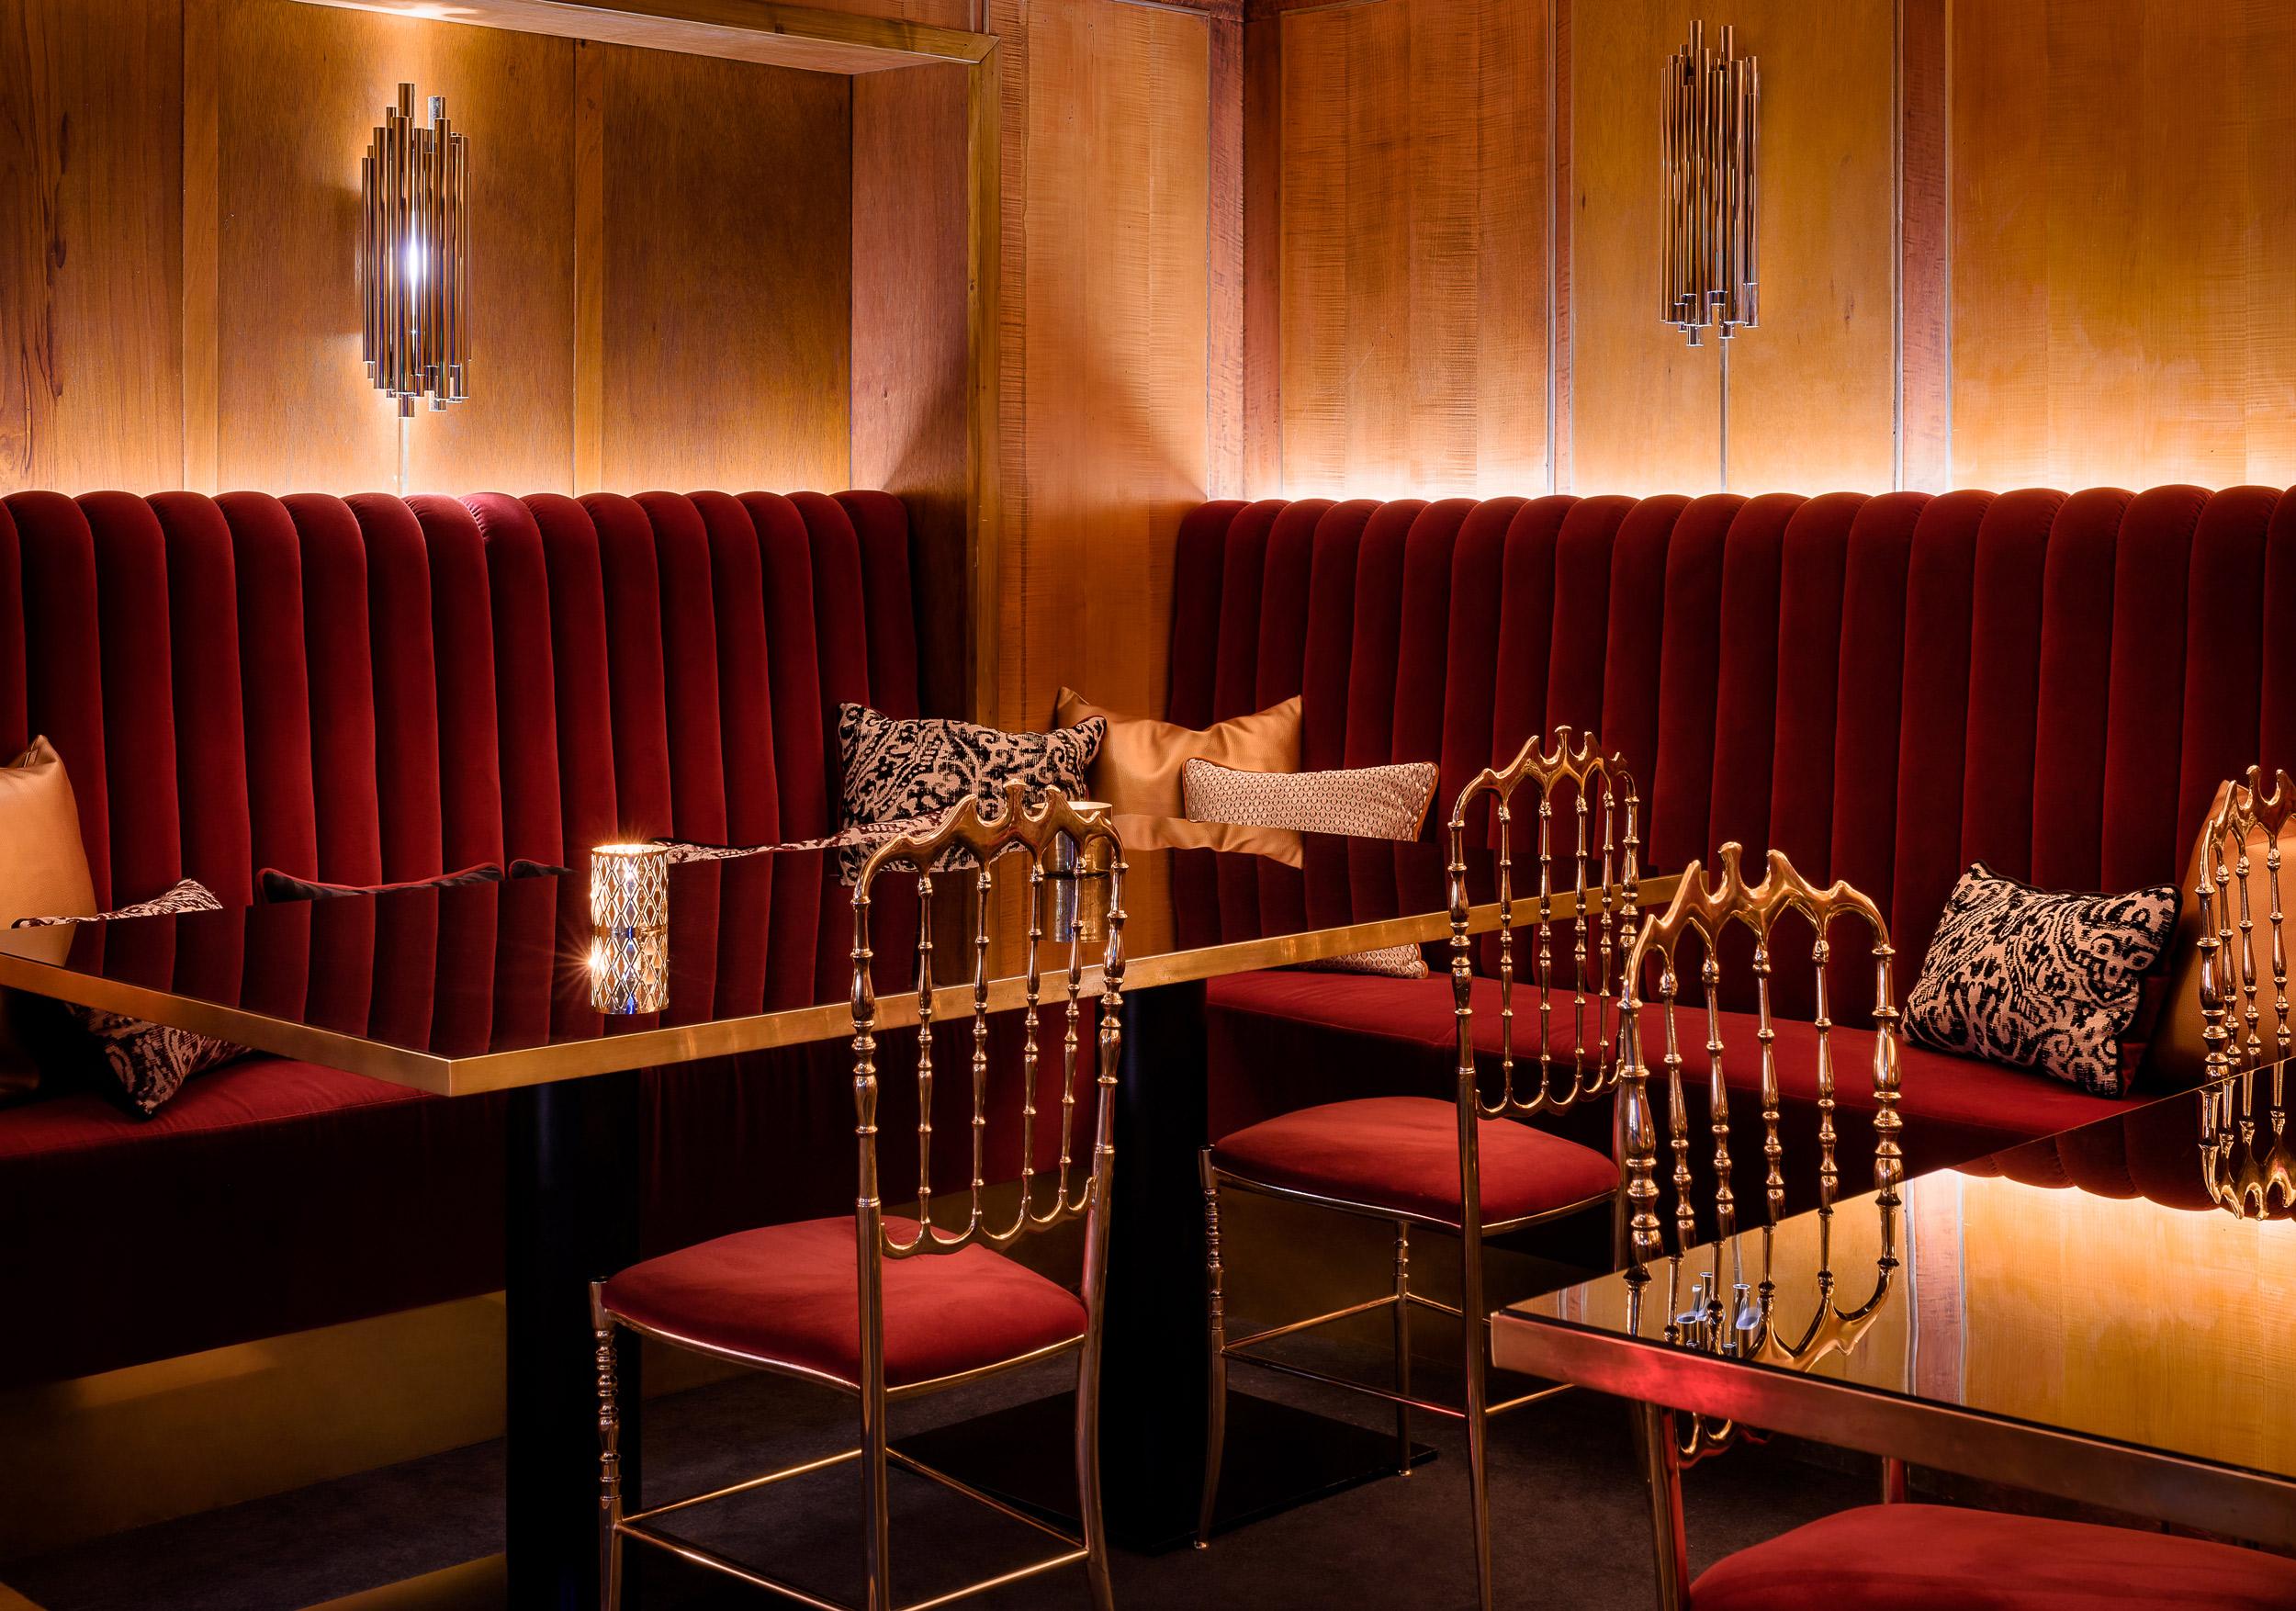 Mezzanine1-Christiania-theater.jpg